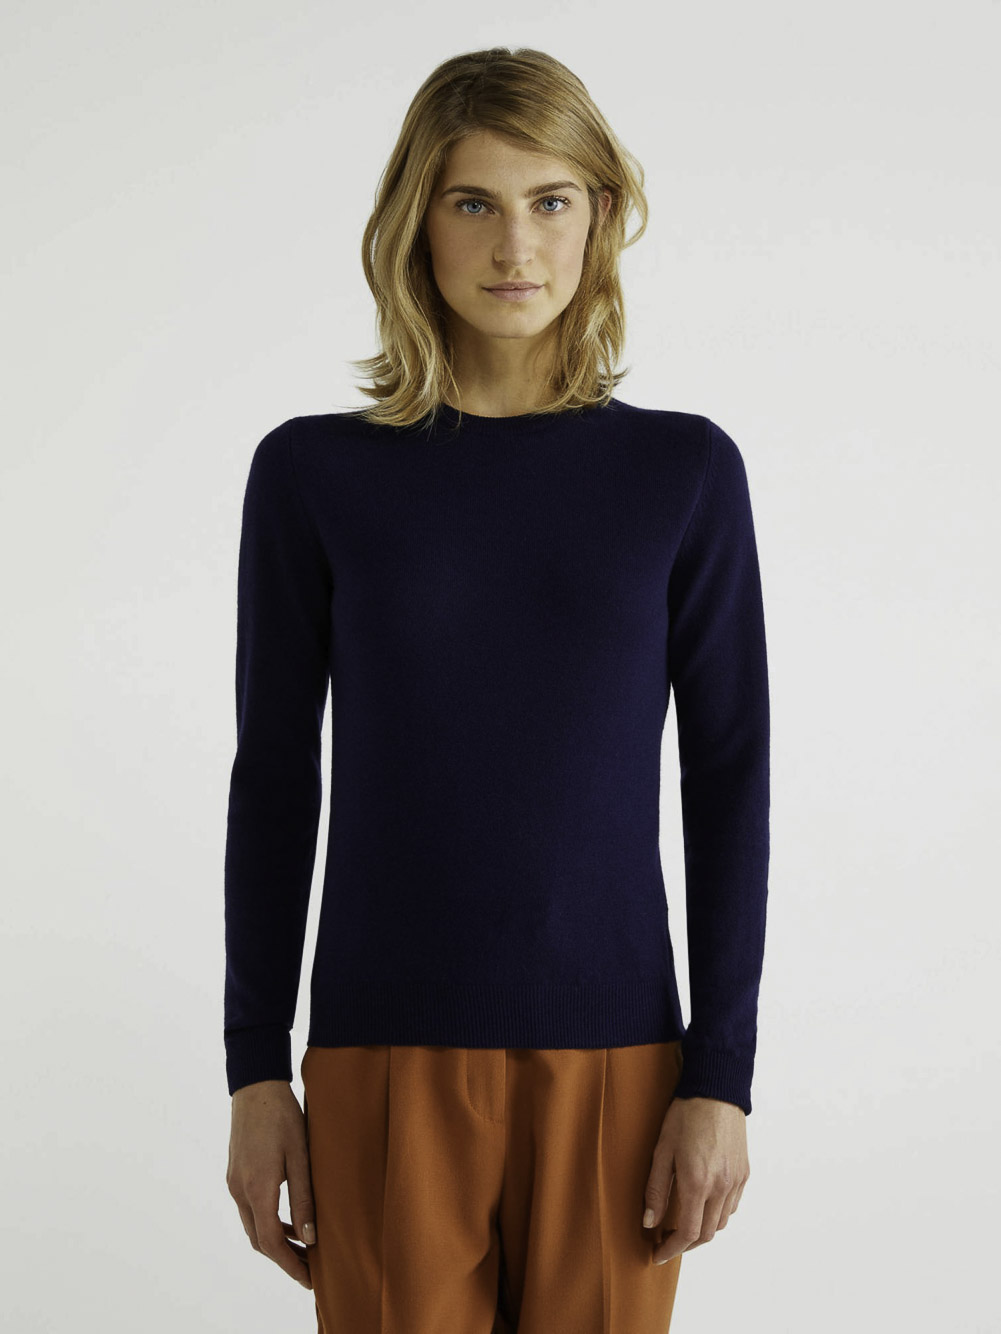 BENETTON Μπλούζα με λαιμόκοψη 100% παρθένο μαλλί 1002D1K01 20A016